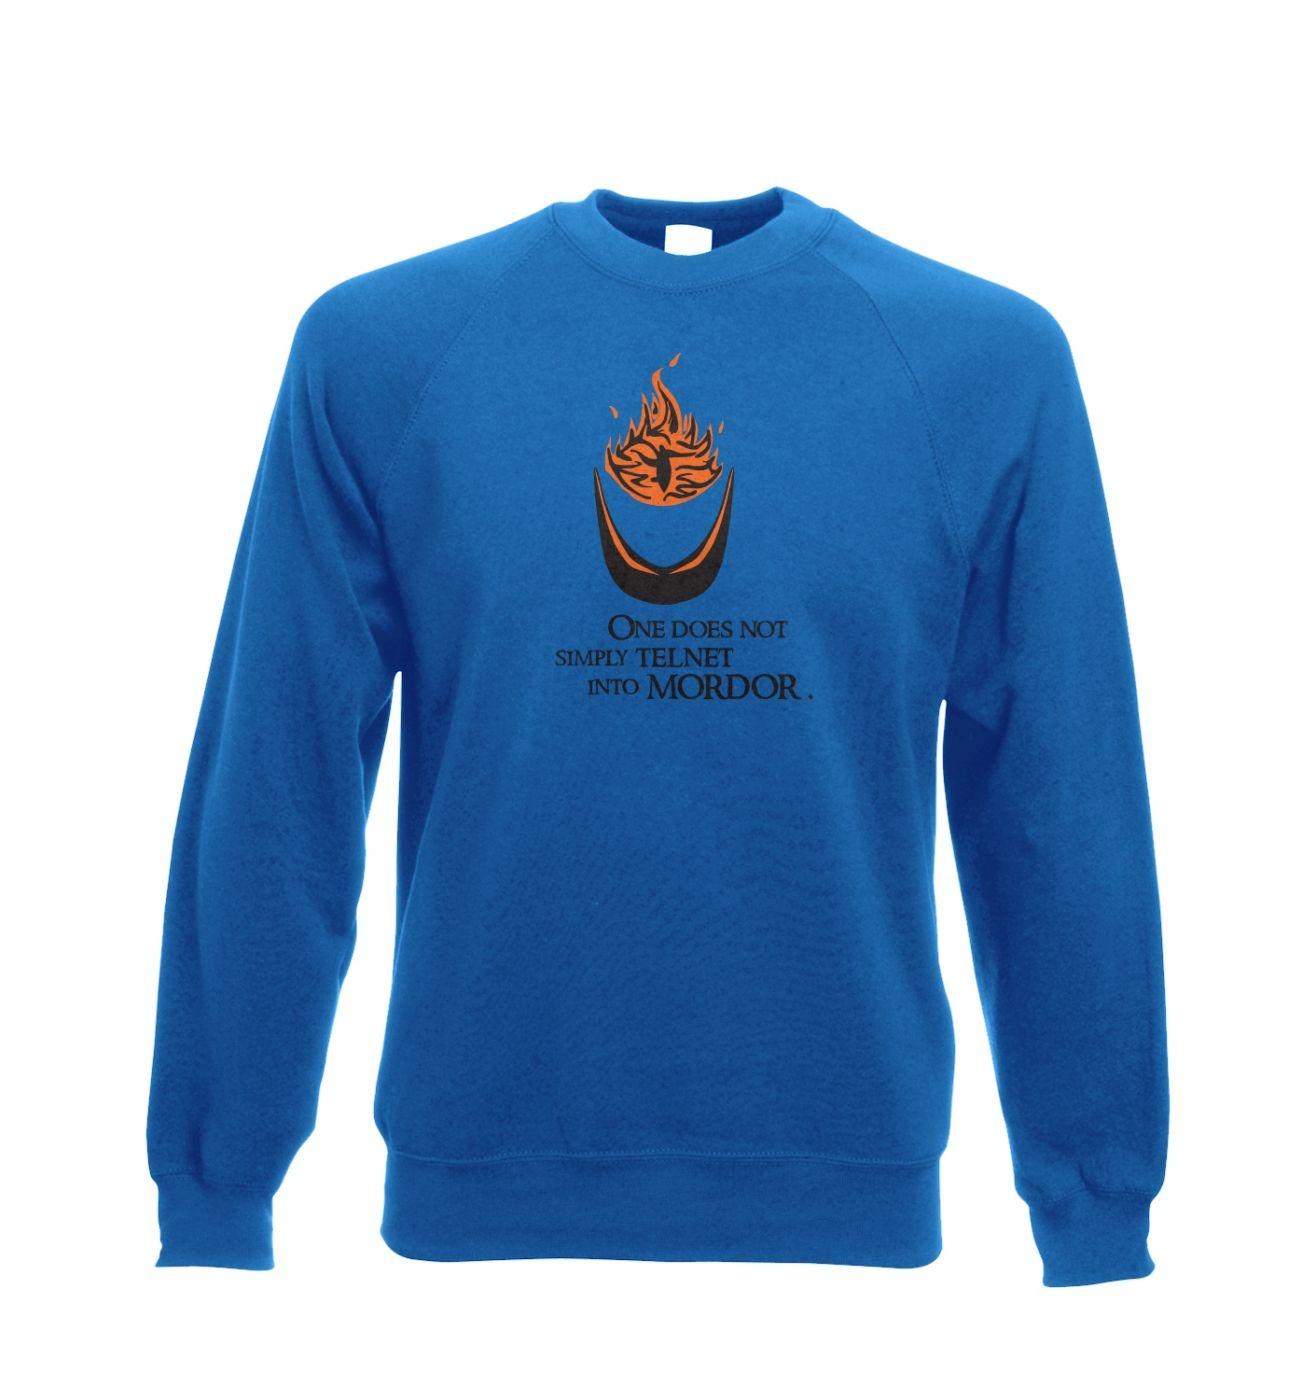 Telnet into Mordor adult crewneck sweatshirt